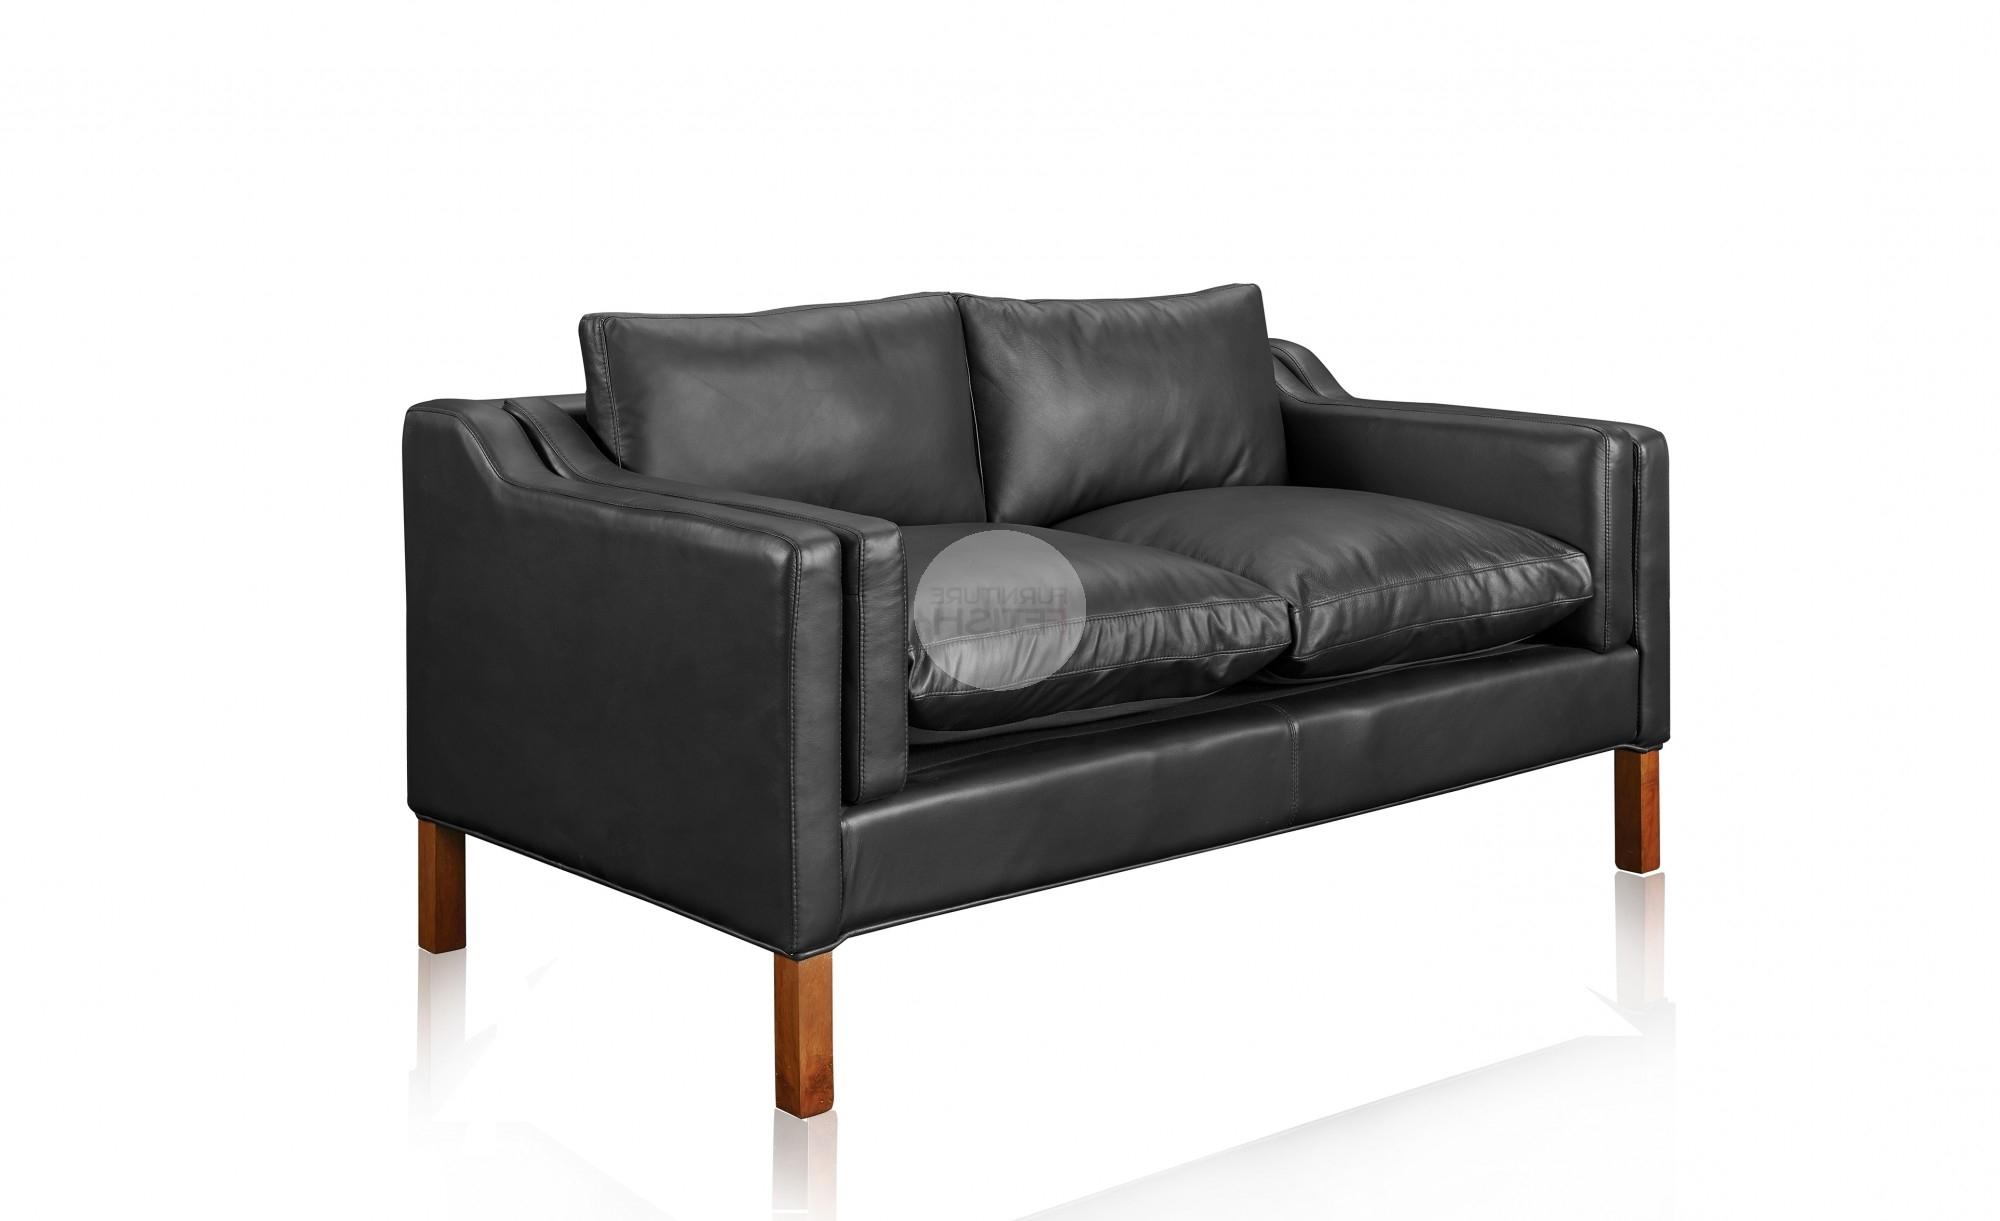 Black 2 Seater Sofas Regarding Most Current Replica Borge Mogensen 2 Seater Sofa – Black Aniline Leather (View 4 of 20)